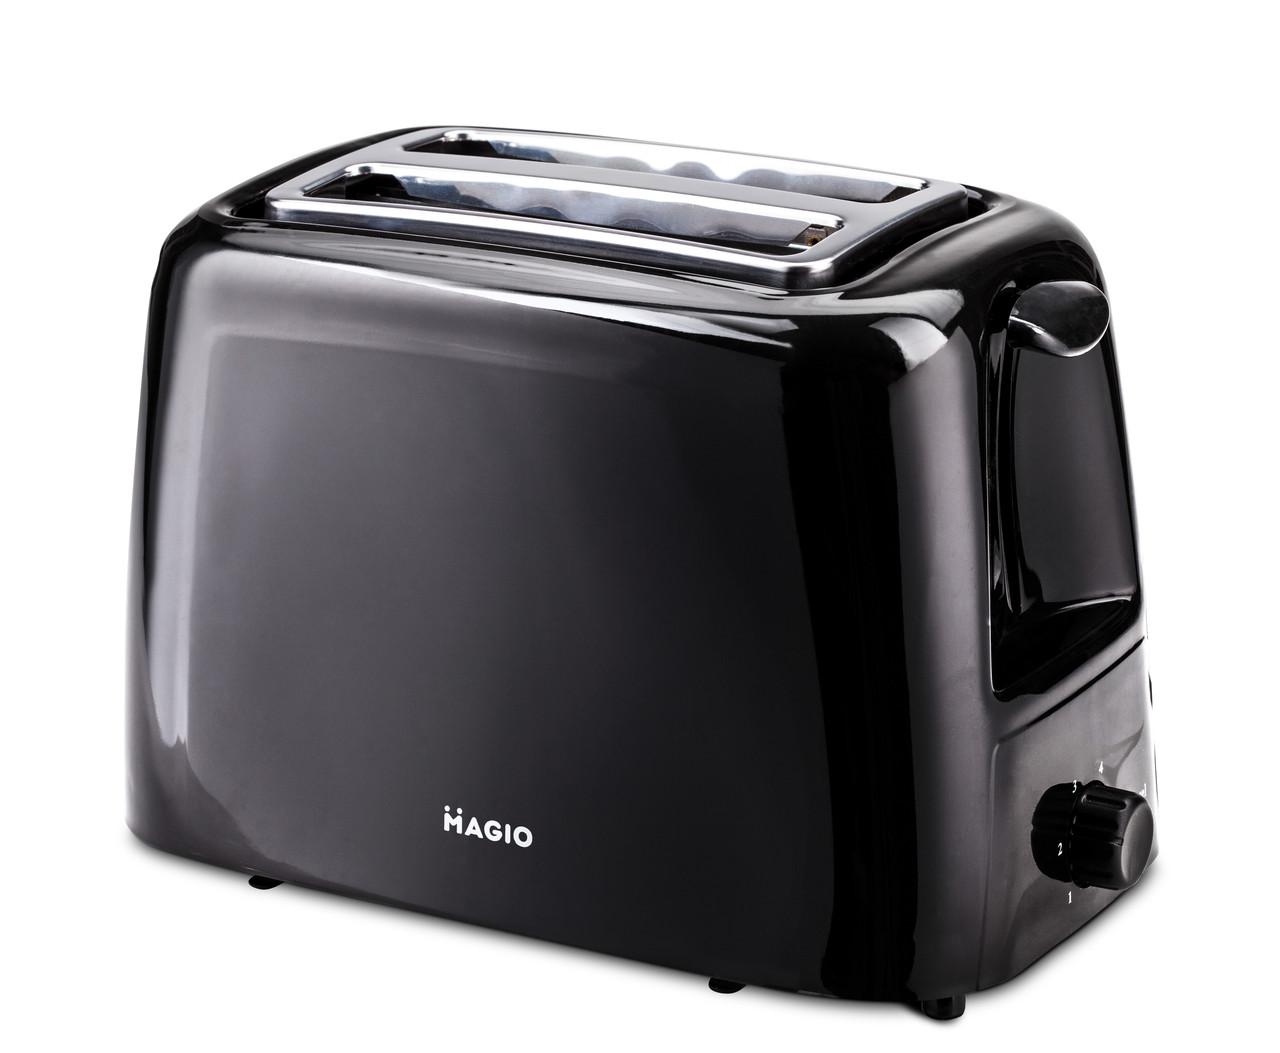 Тостер MAGIO МG-273BL/750 Вт/2 ломтика